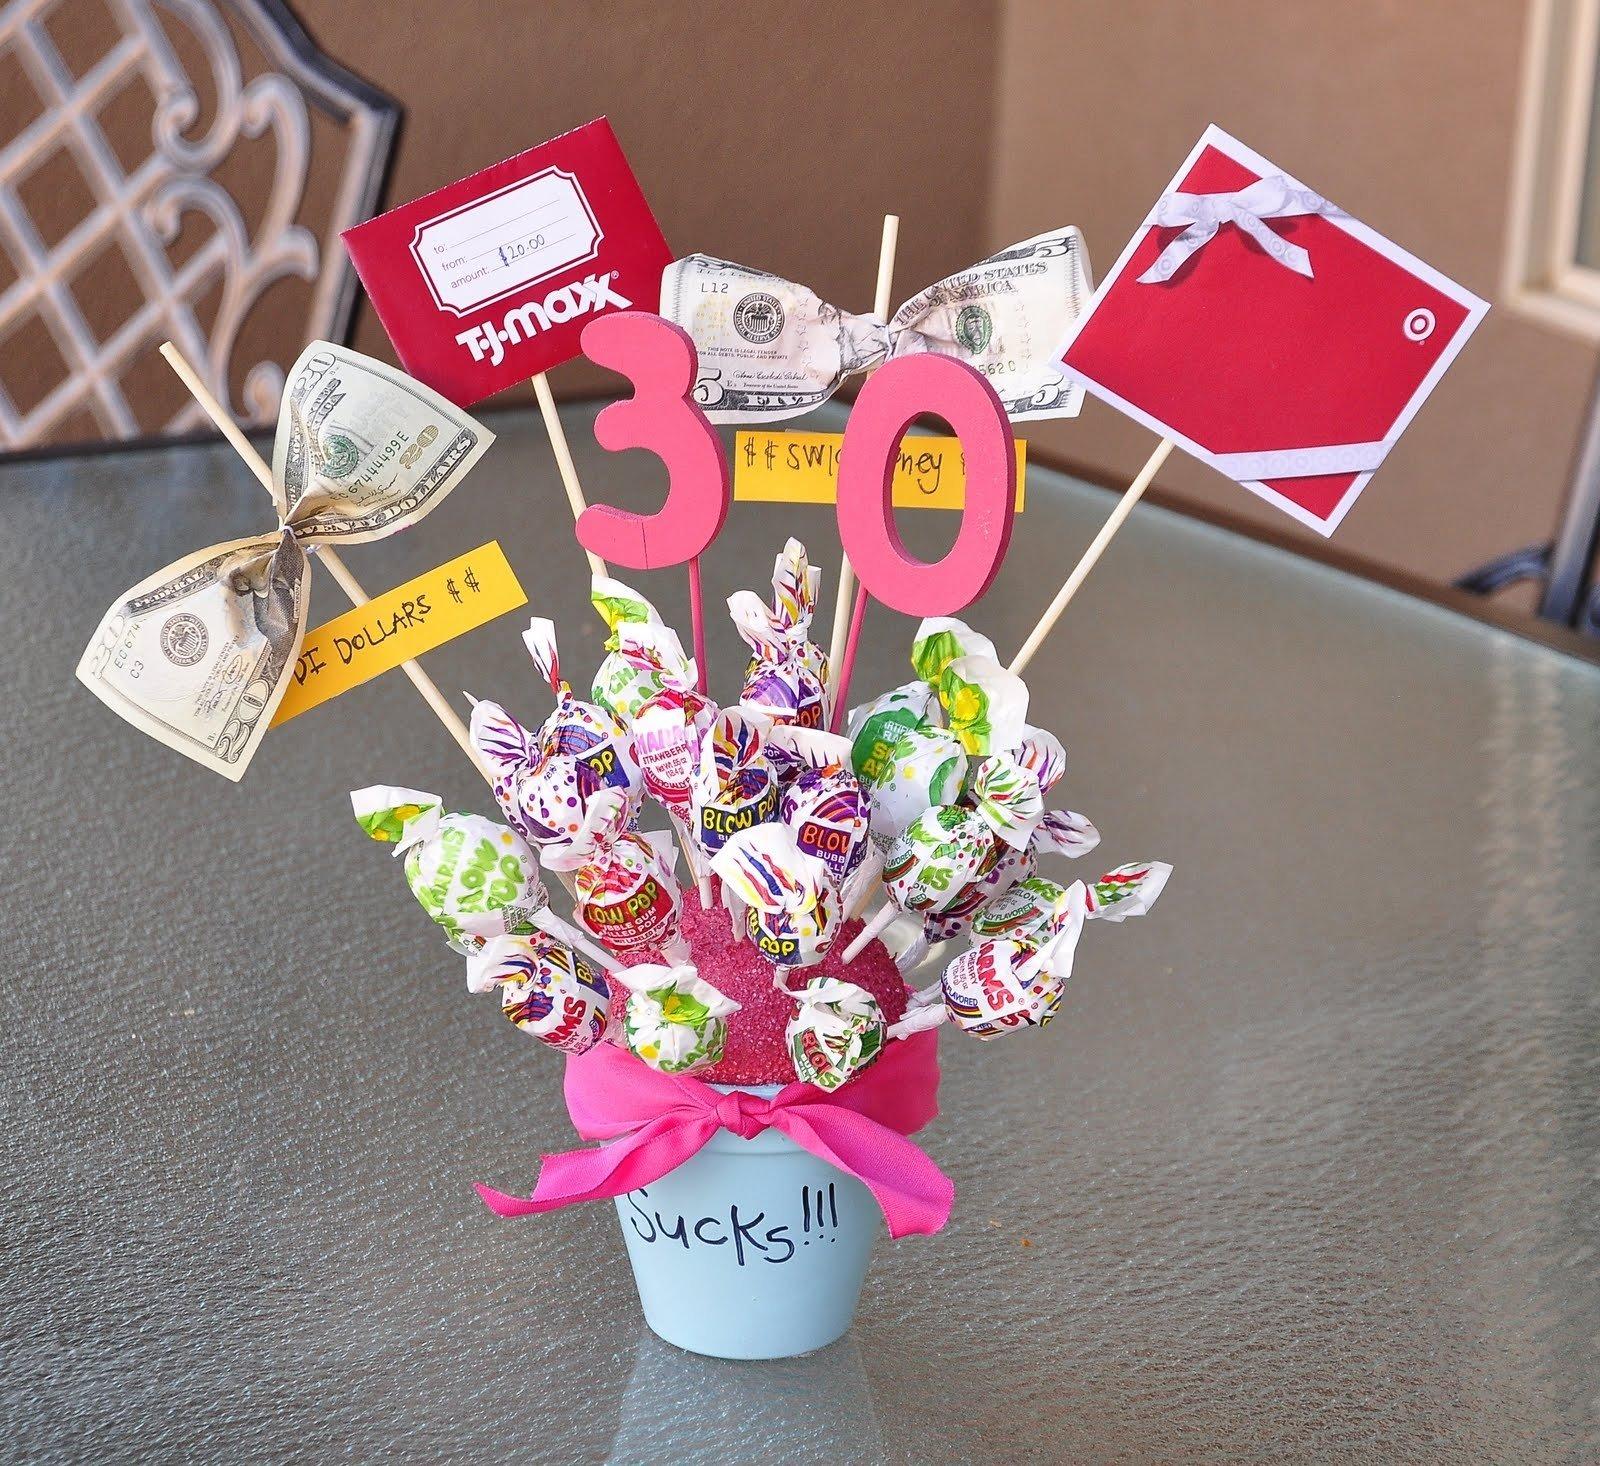 10 Lovely Creative Birthday Gift Ideas For Boyfriend 30th birthday party 30th birthdays and gift 5